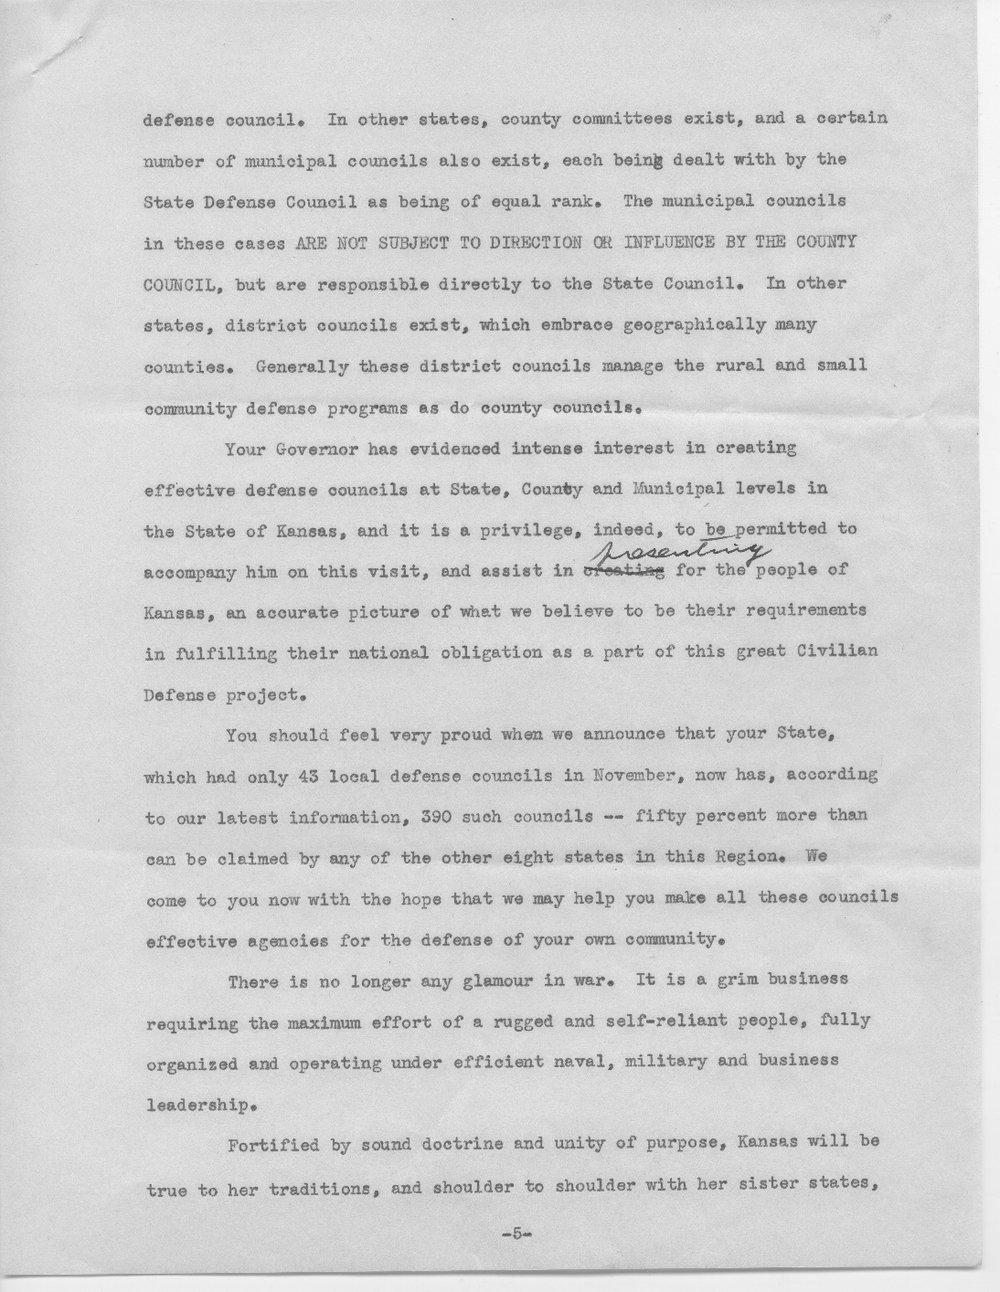 Address by Col. E.L. Wilbur - 5